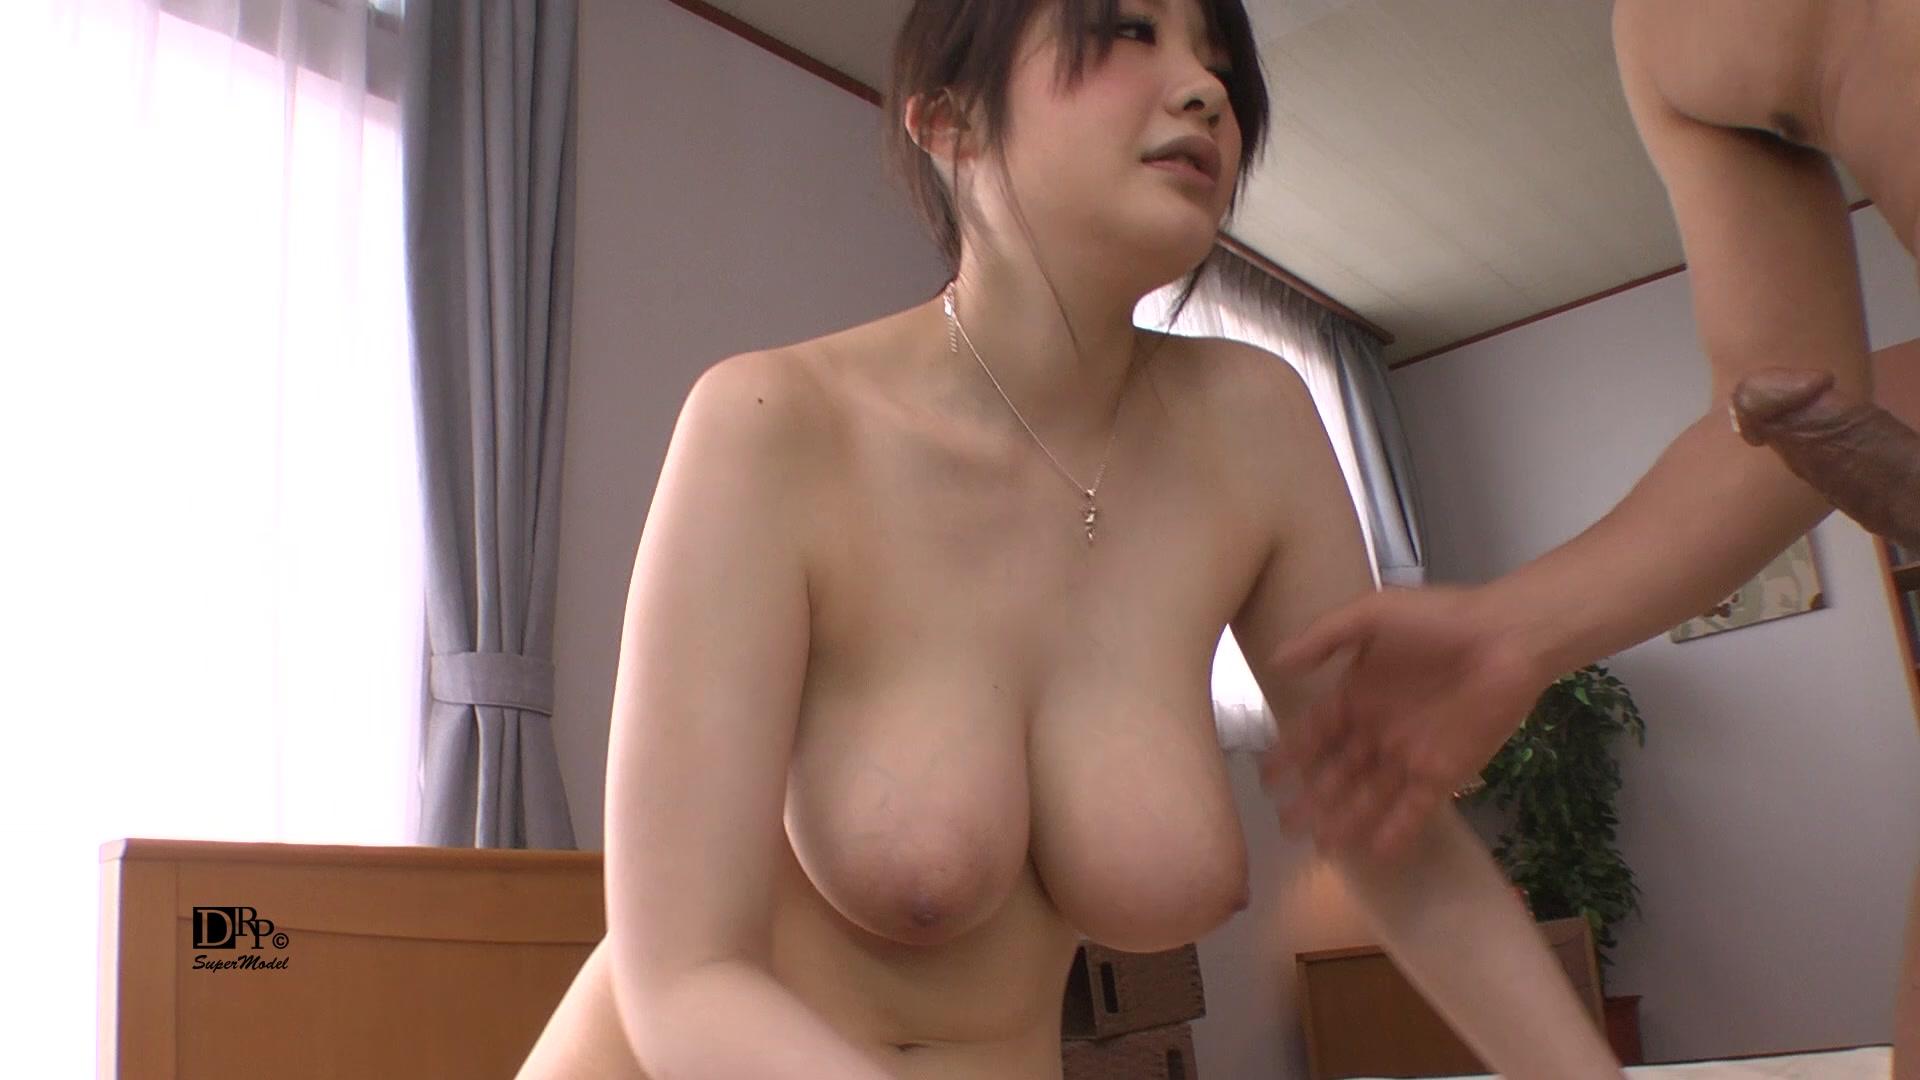 Junior jailbait girl naturism photos